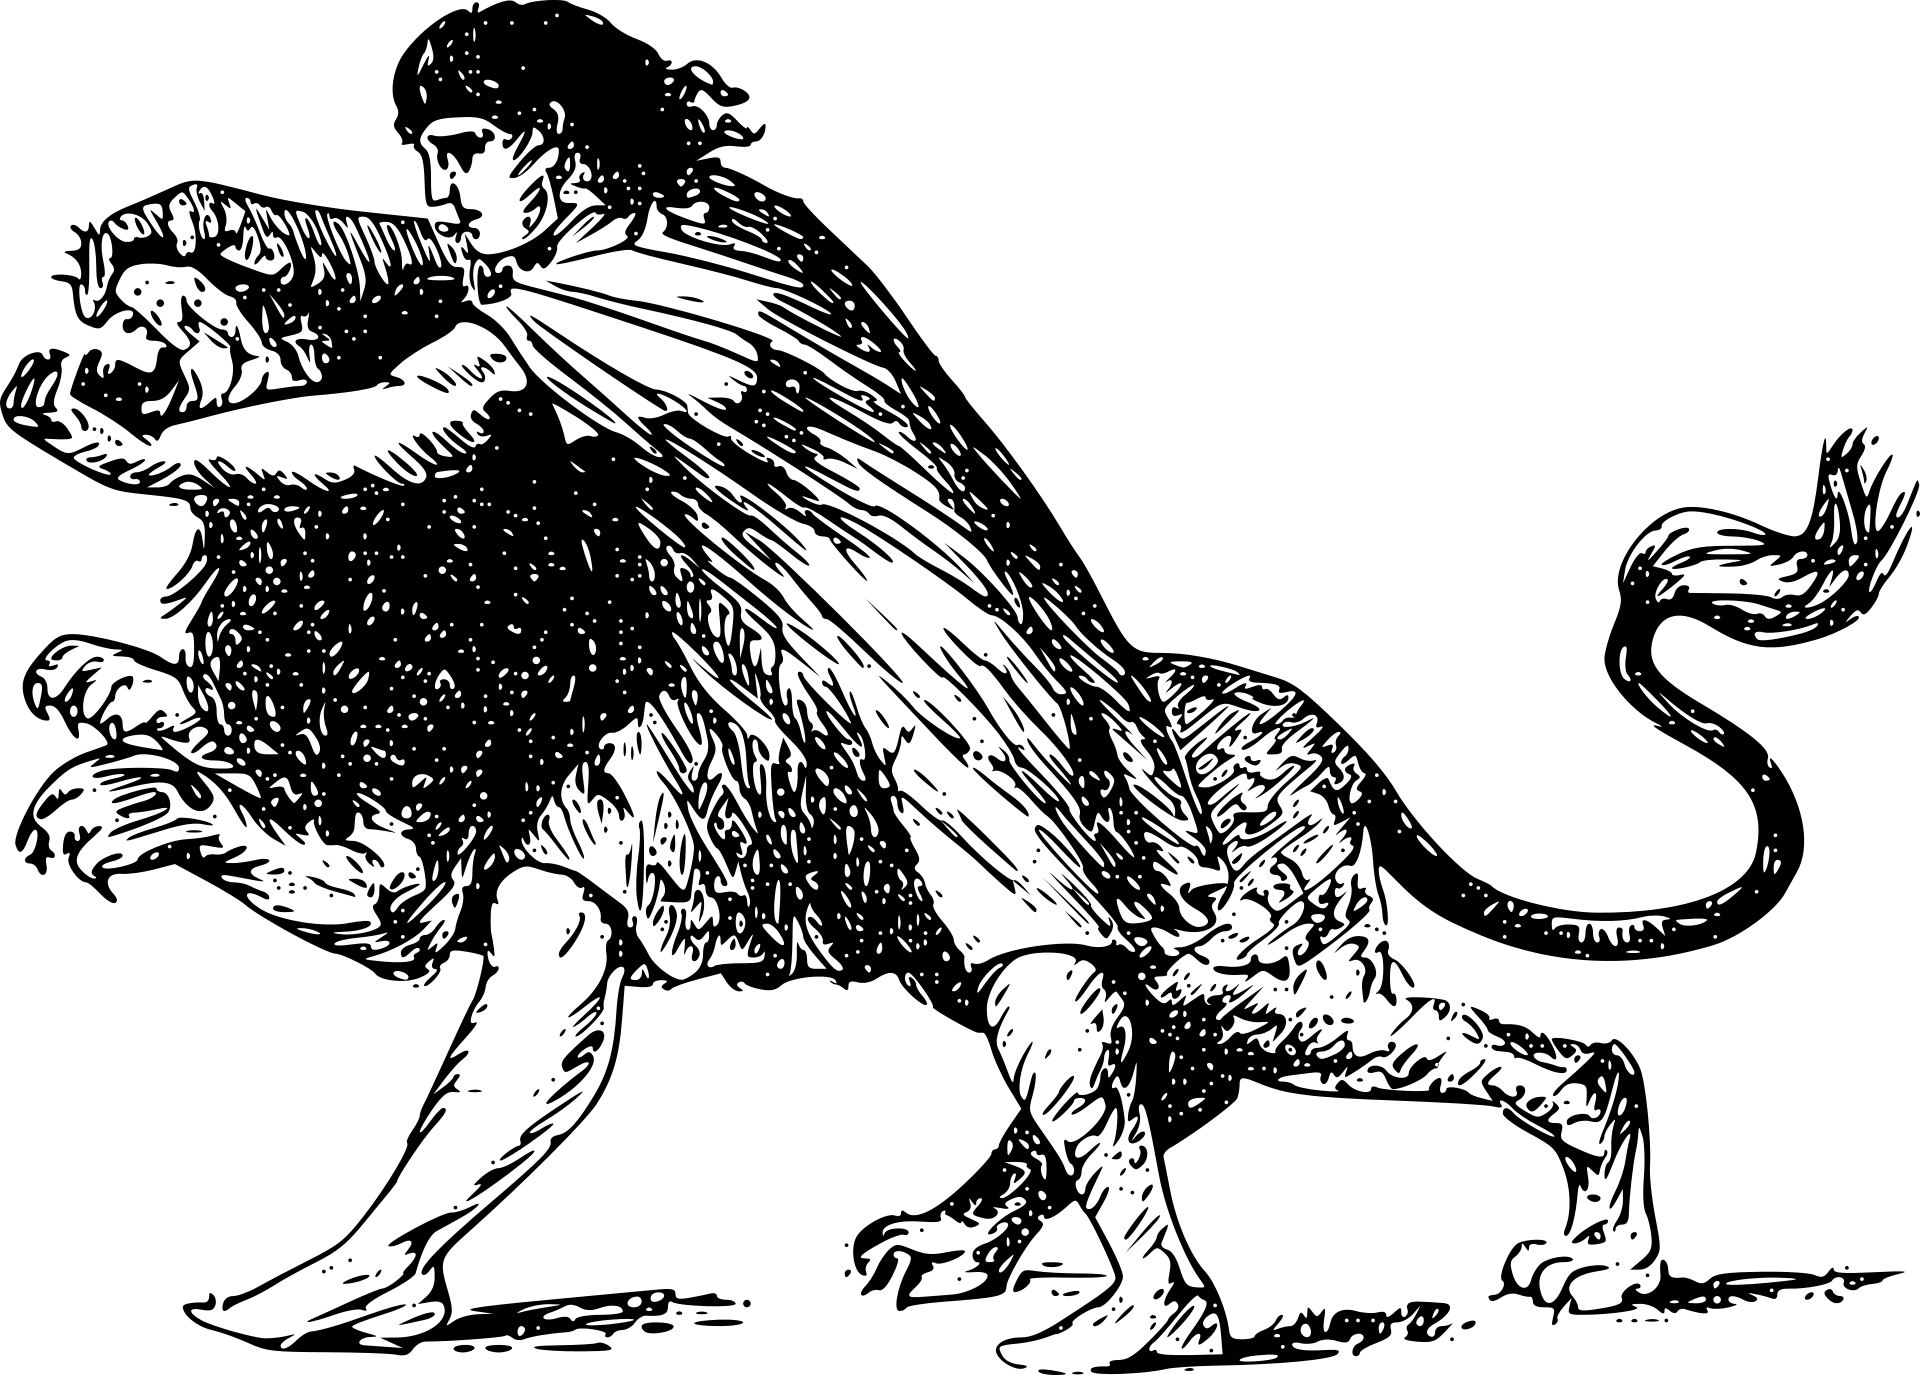 flaglagalgala